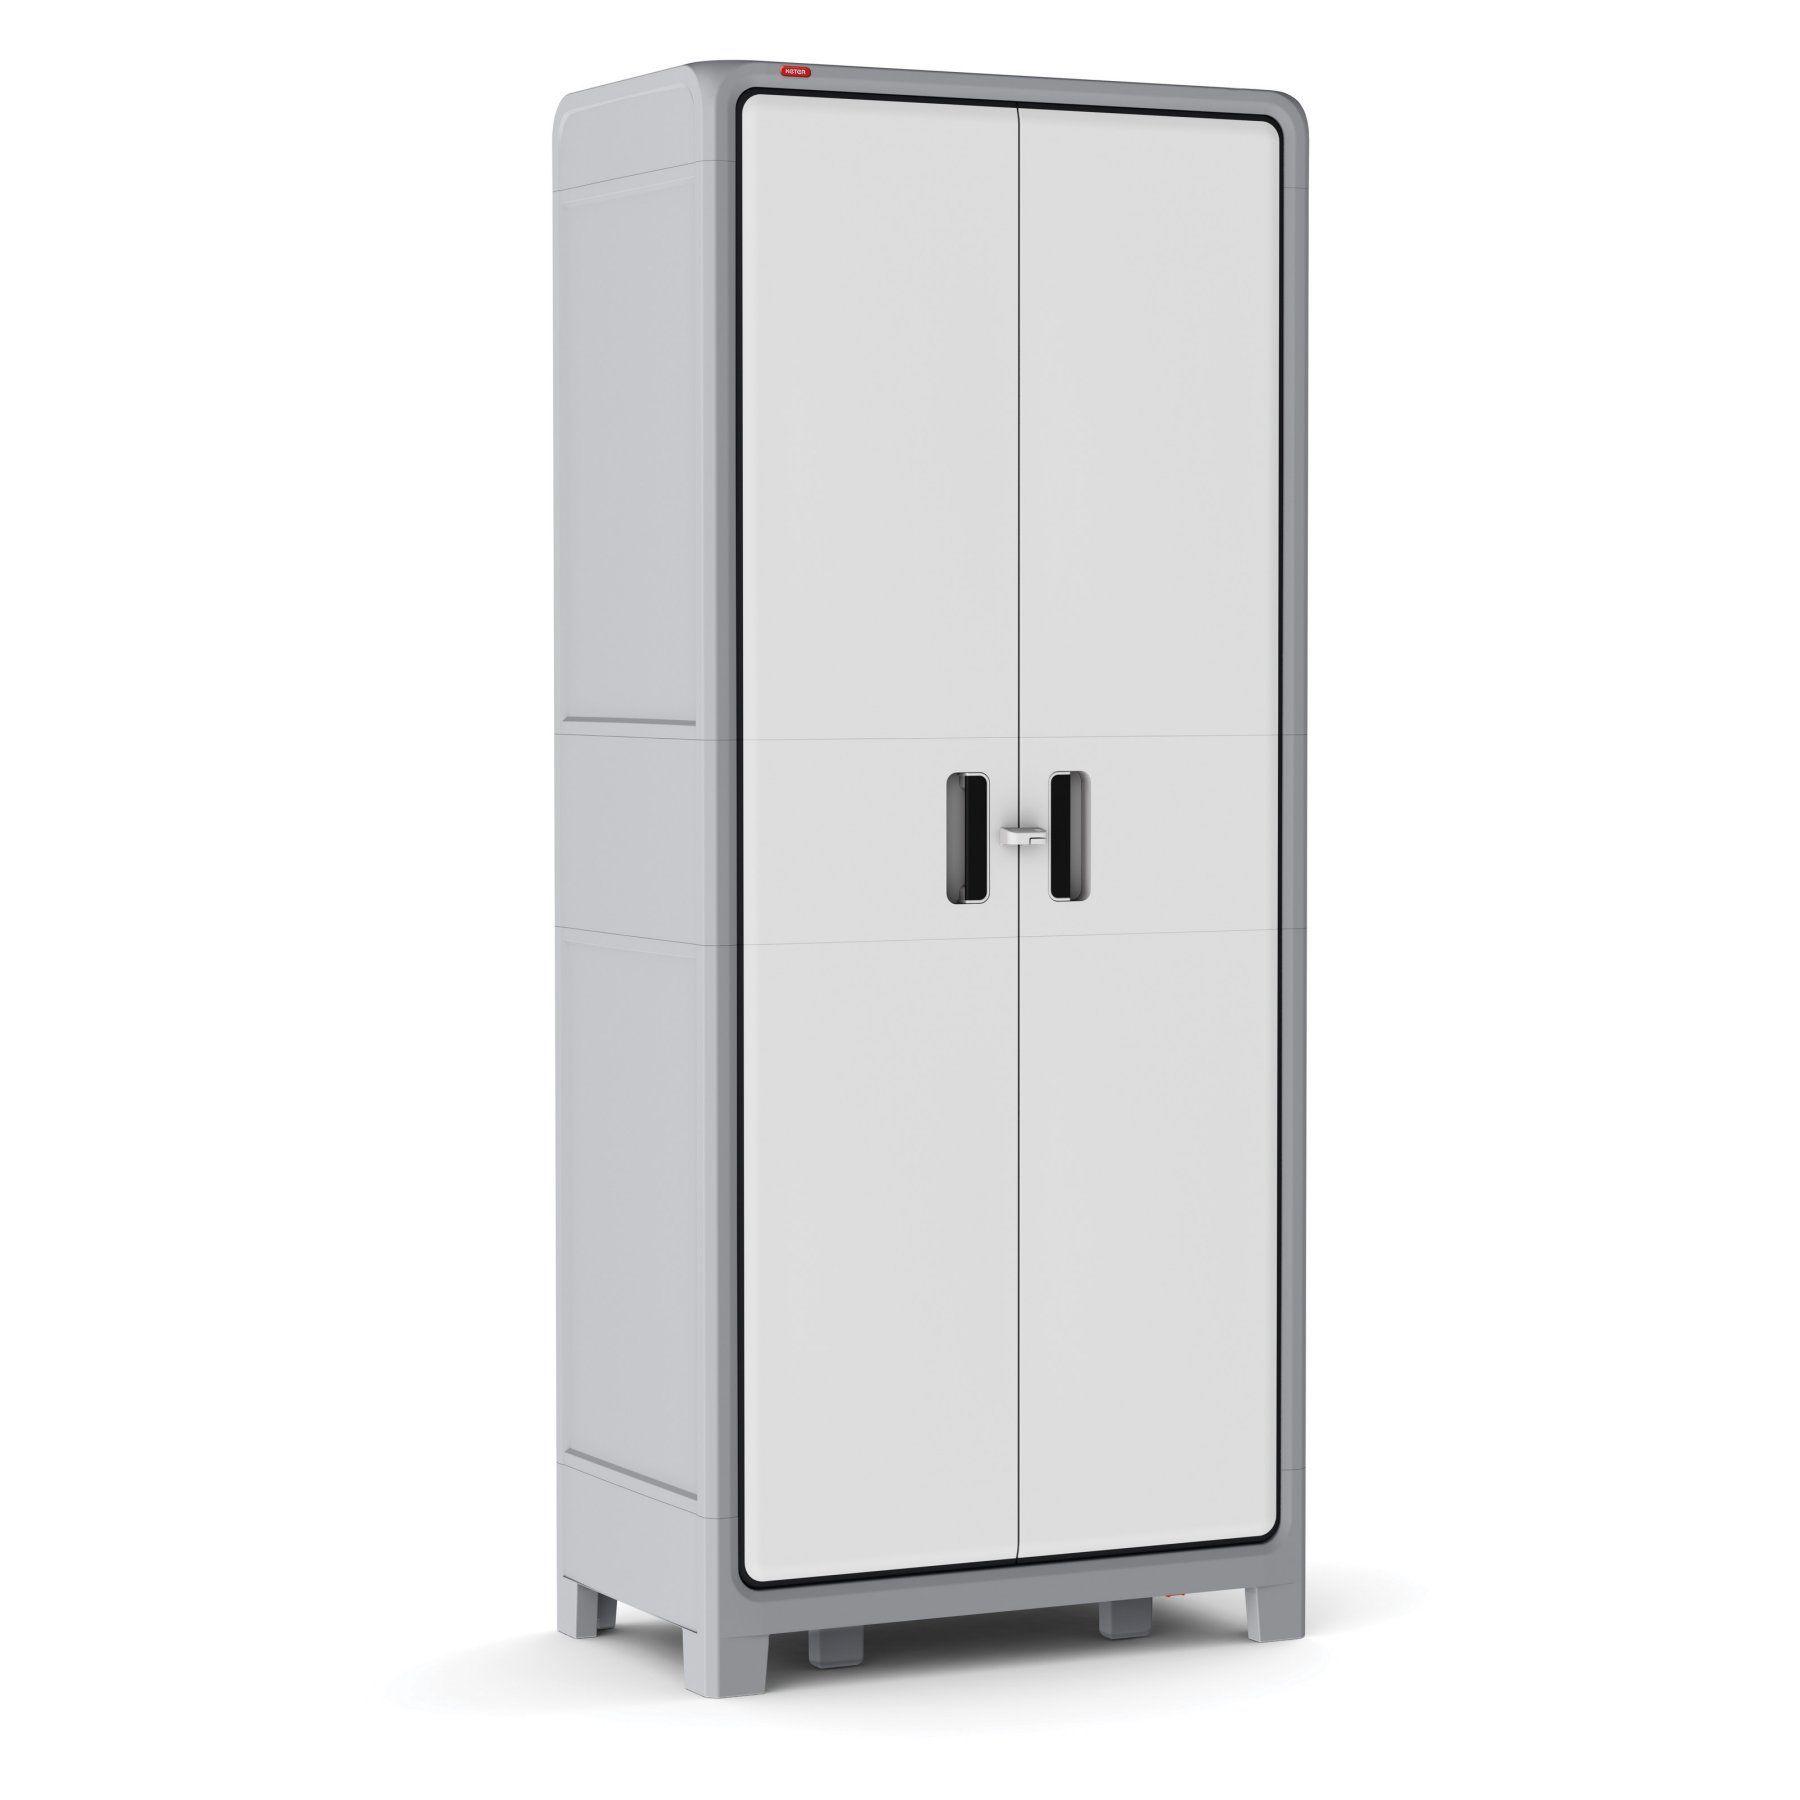 Wonderful Keter Optima Wonder 6 Ft. Tall Indoor Garage Cabinet   225832